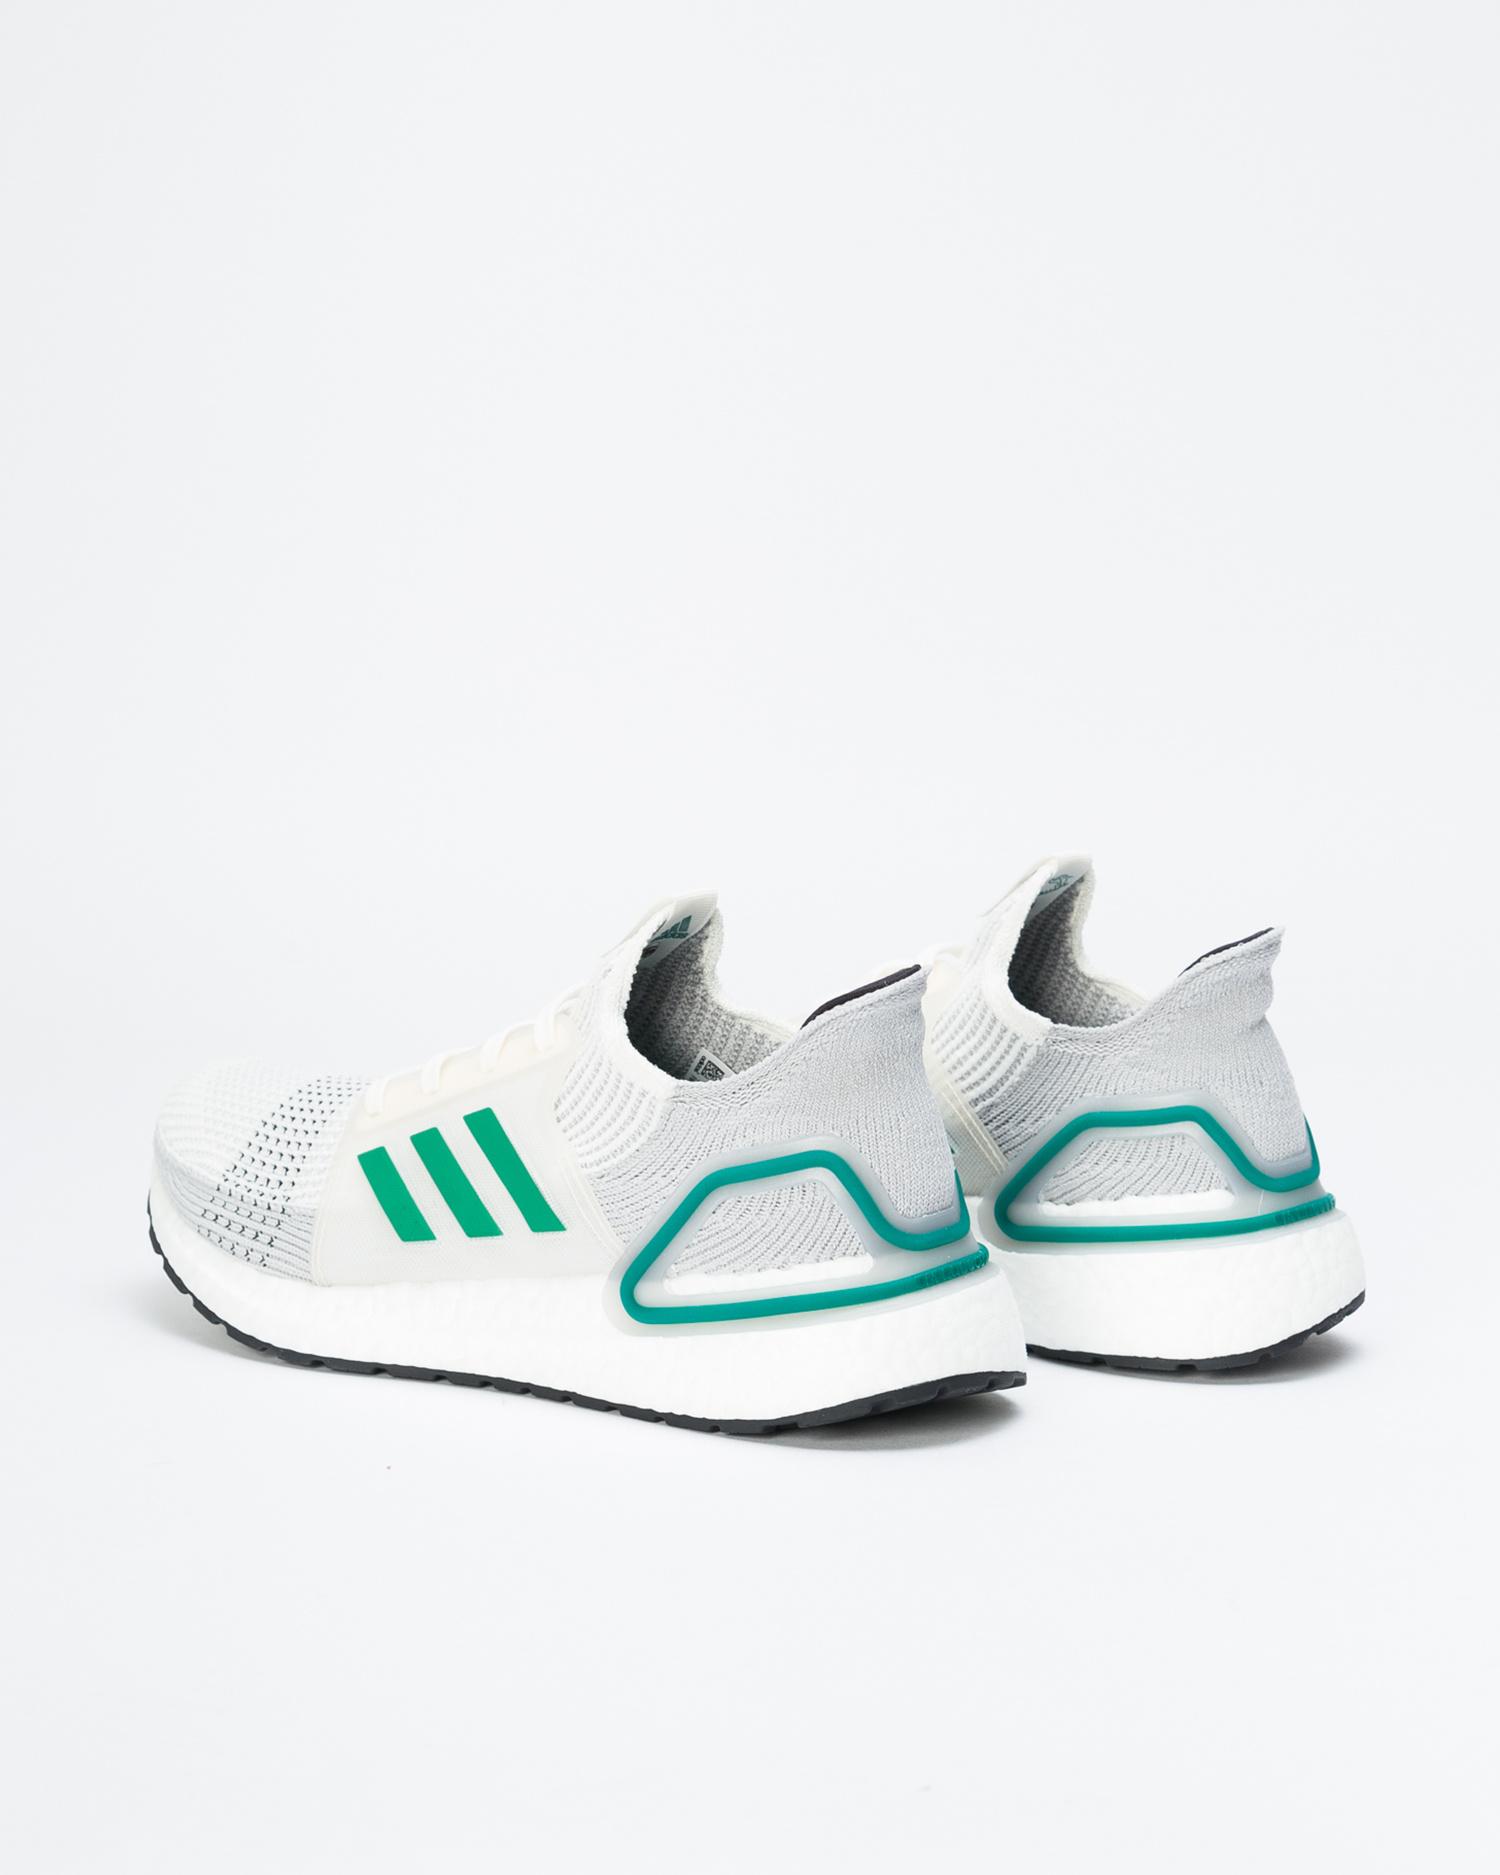 adidas Consortium Ultraboost 19 White/Green